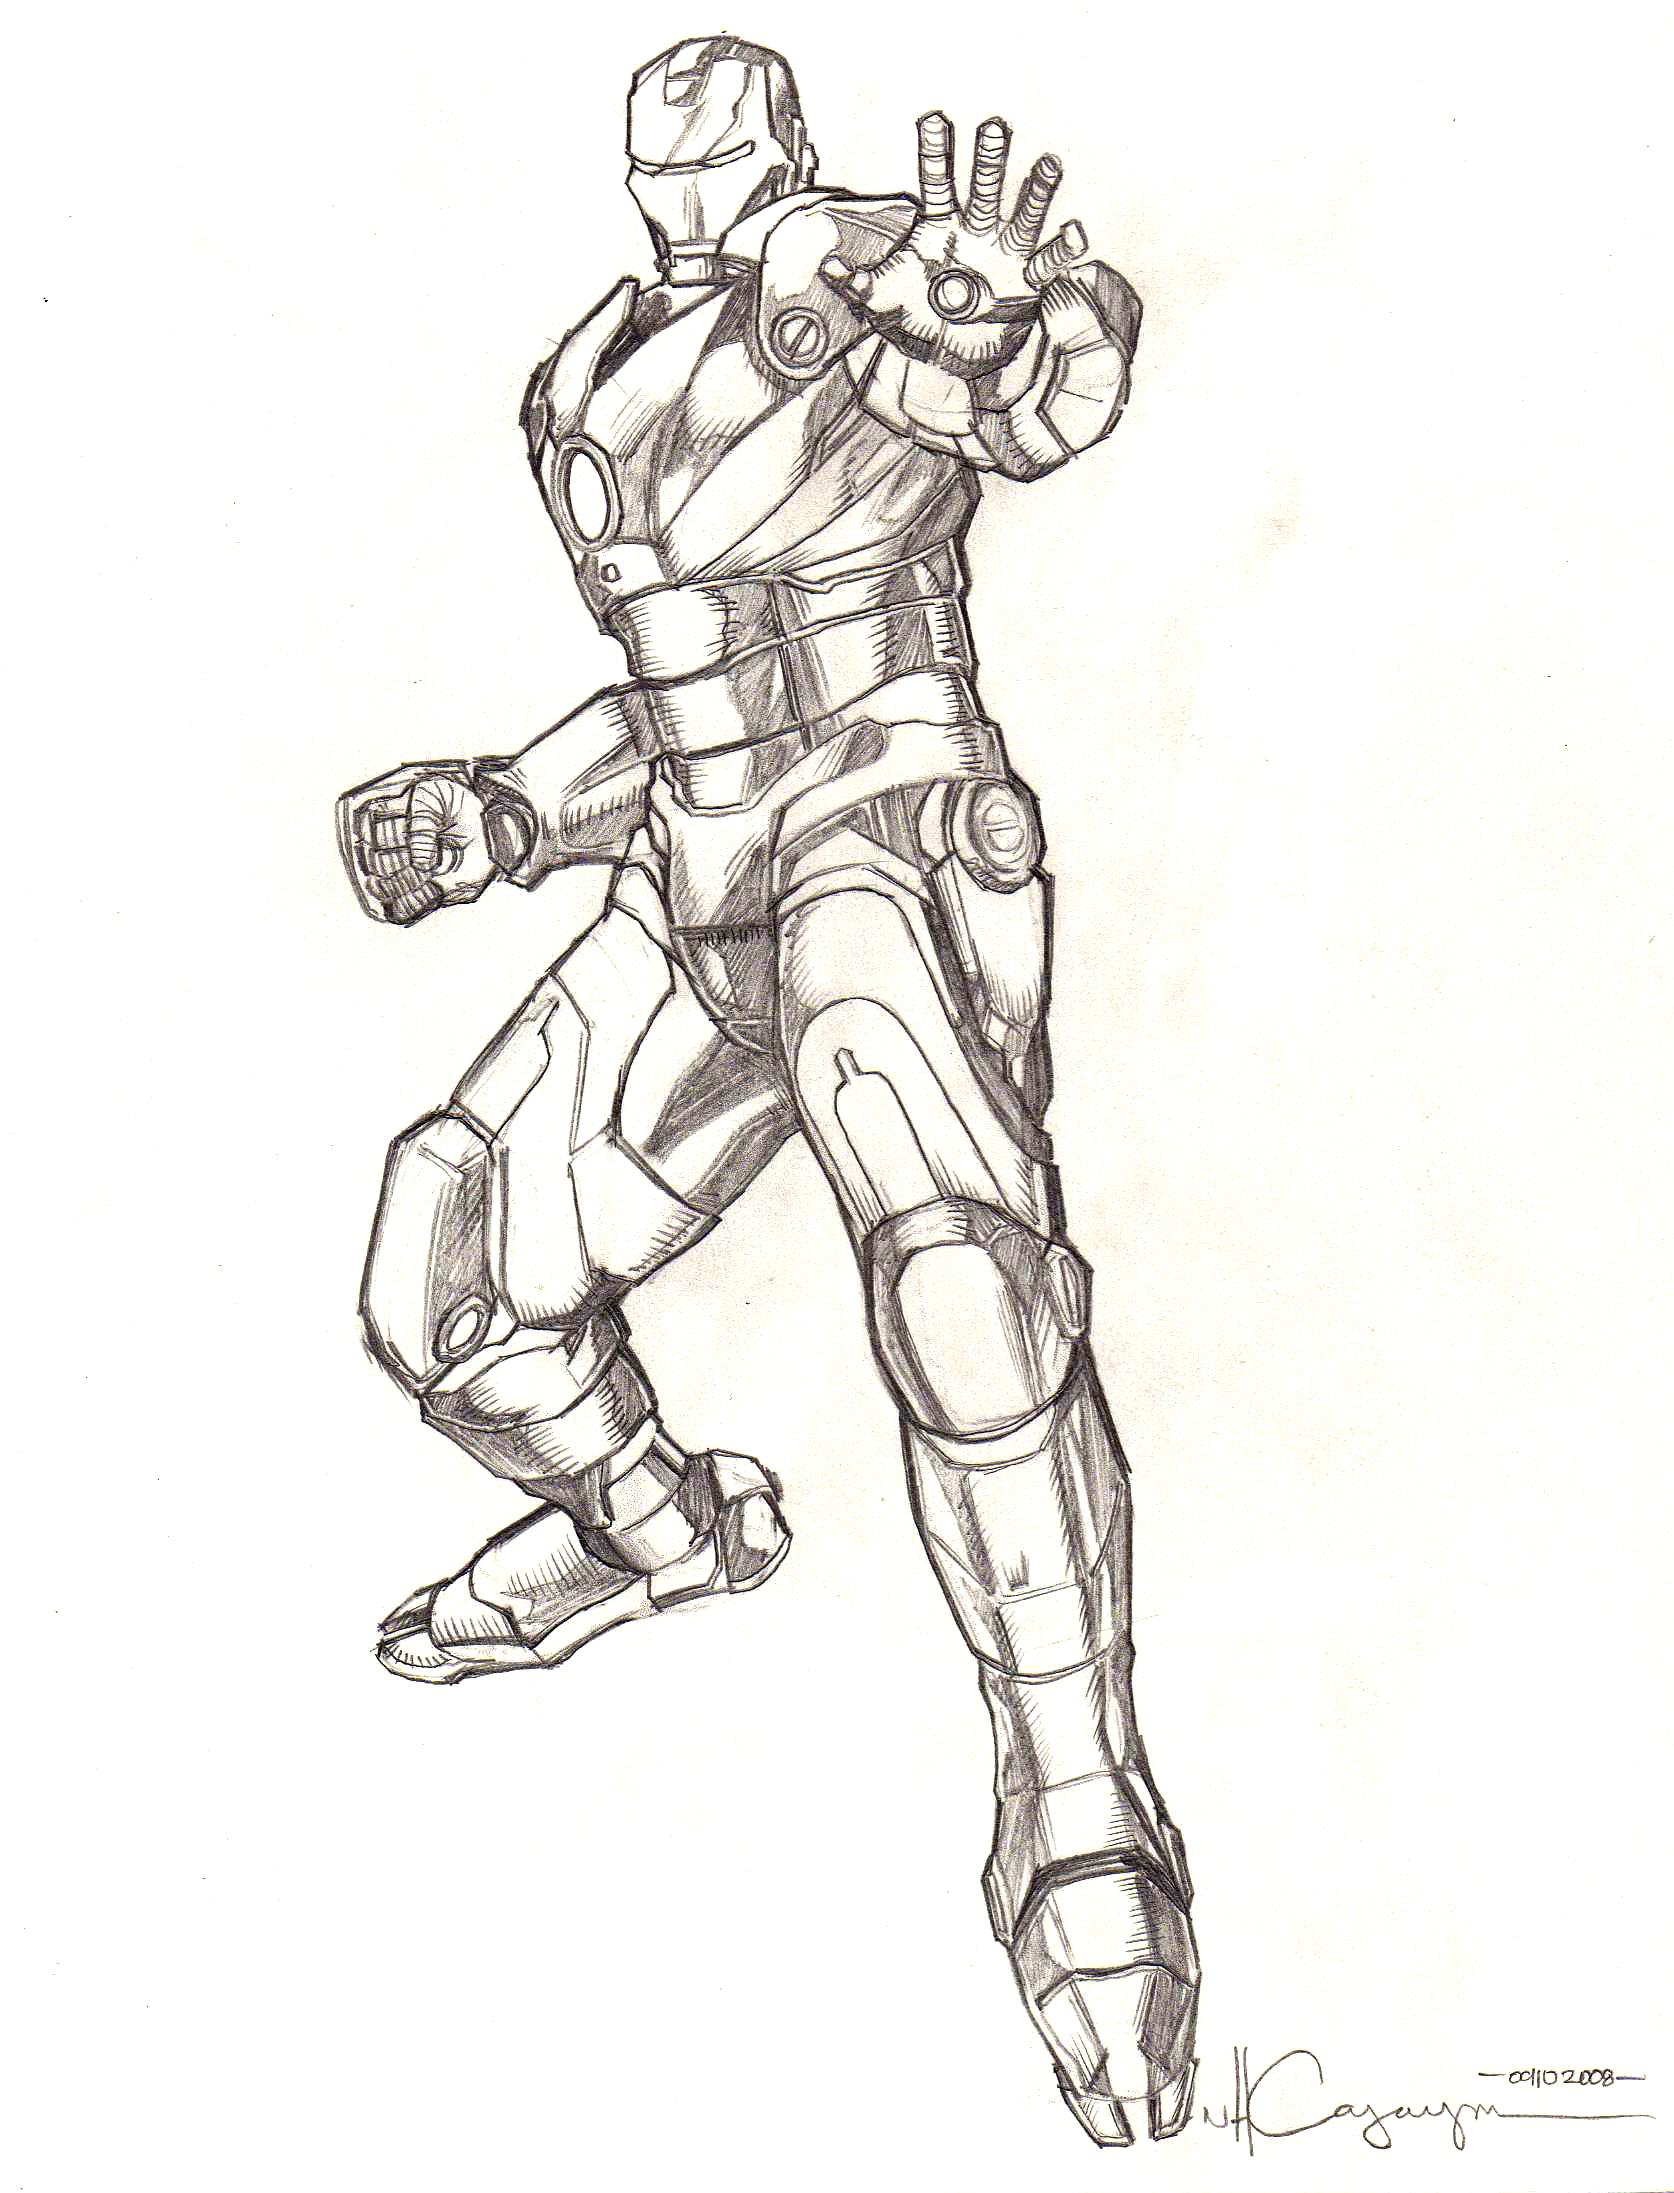 1674x2193 Iron Man 3 Drawings In Pencil Iron Man Mark 3 Pencil 1ncajayon